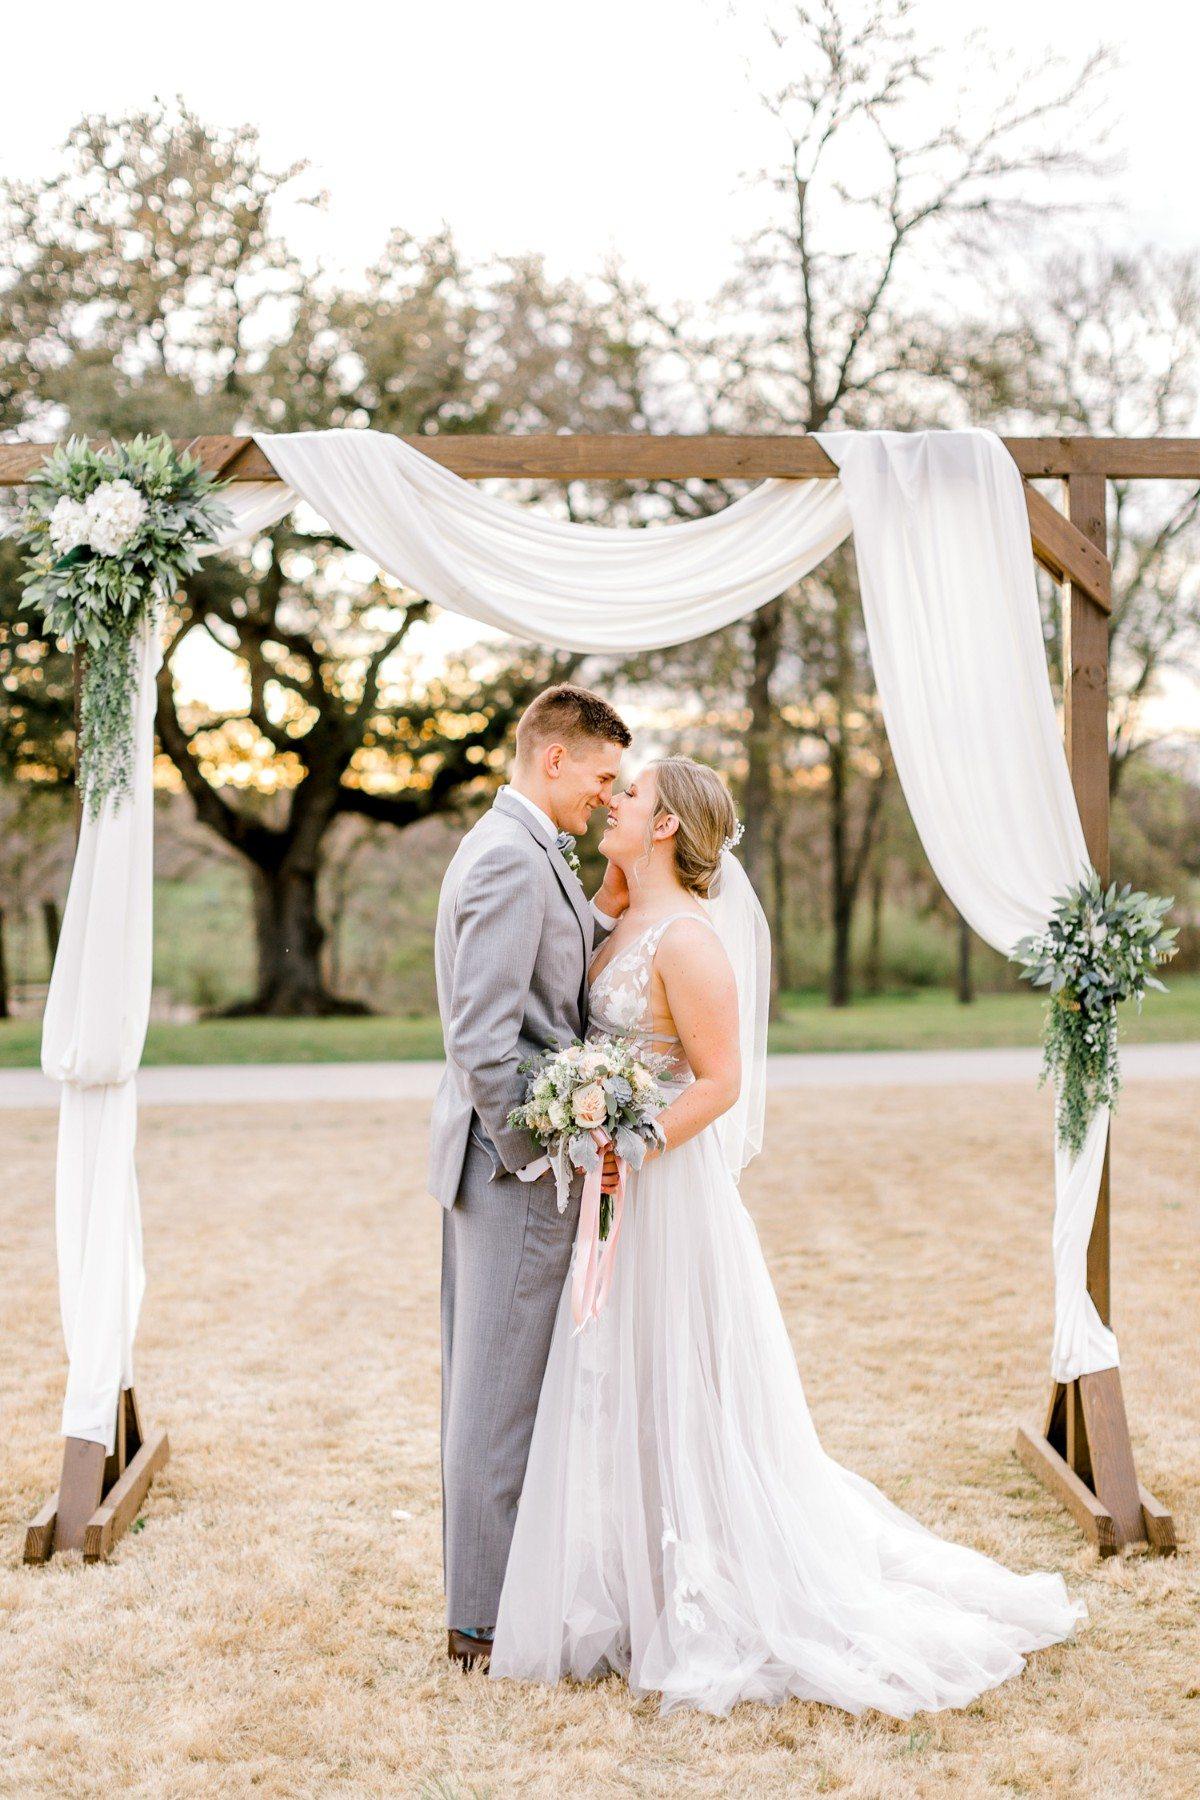 ennis-texas-wedding-photographer-kaitlyn-bullard-100.jpg